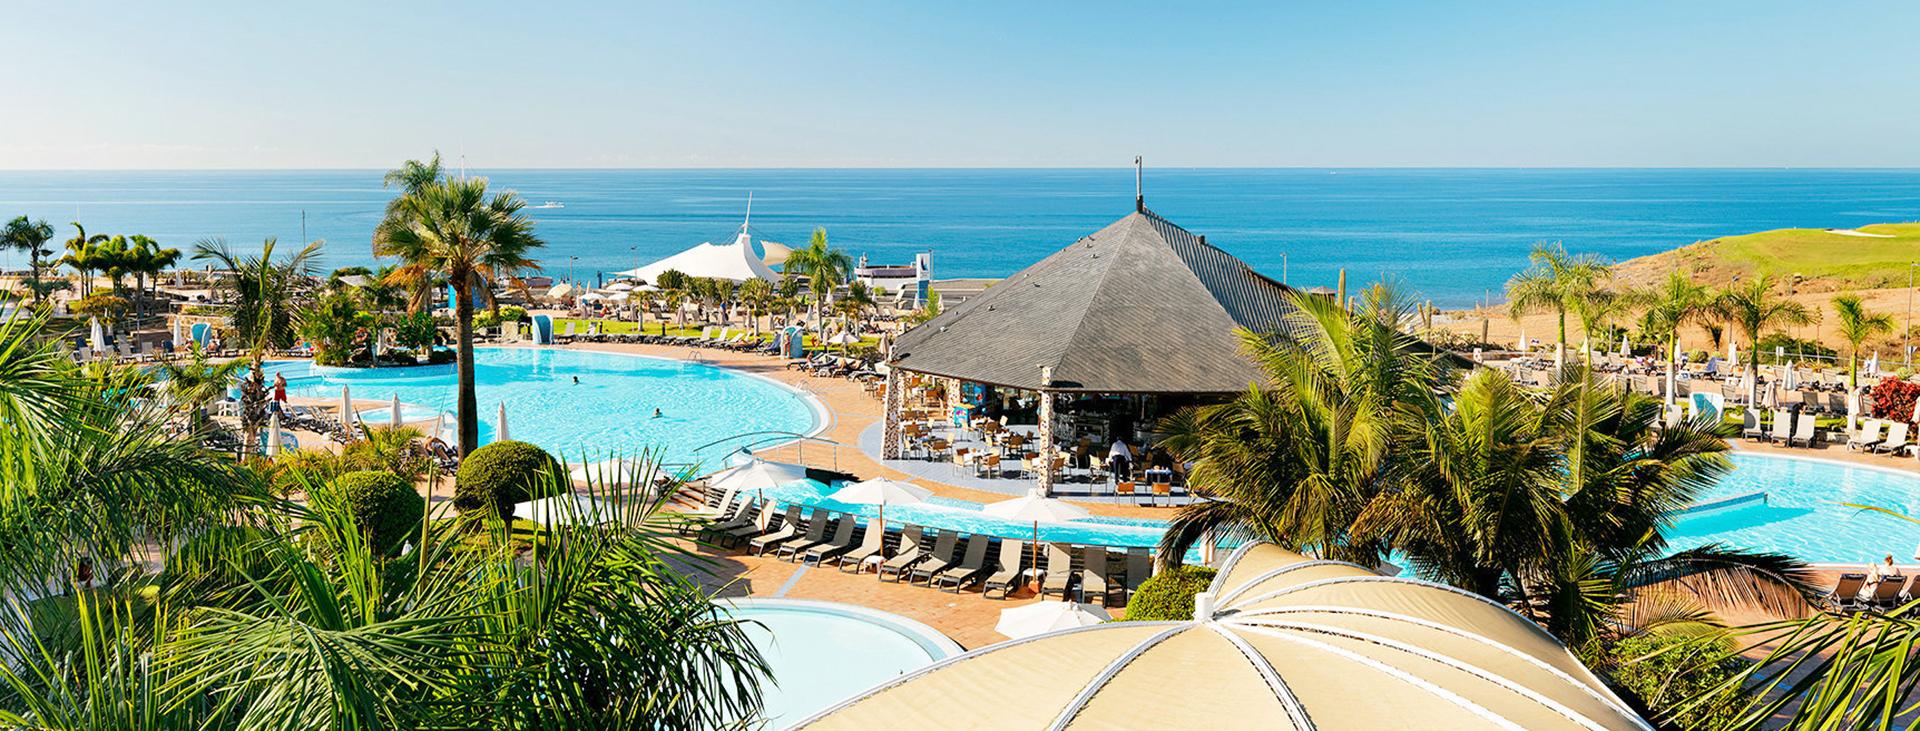 H10 Playa Meloneras Palace, Costa Meloneras, Gran Canaria, Kanarieöarna